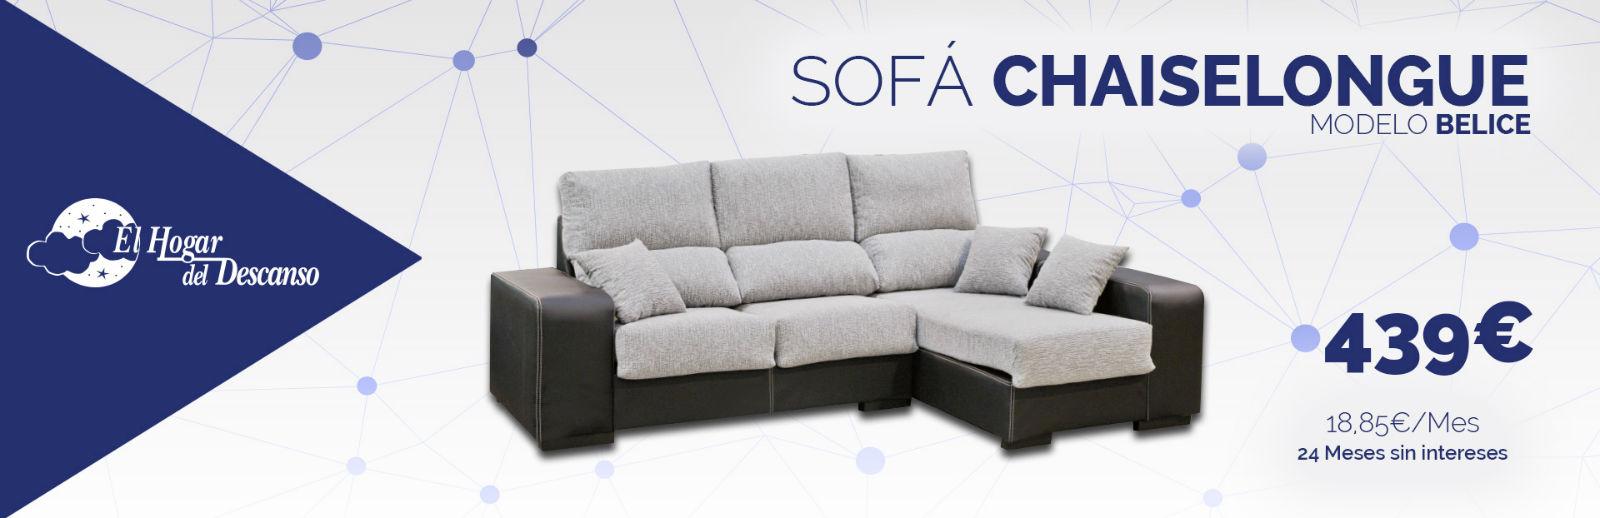 Sof s chaiselongue almer a el hogar del descanso for Sofa almeria